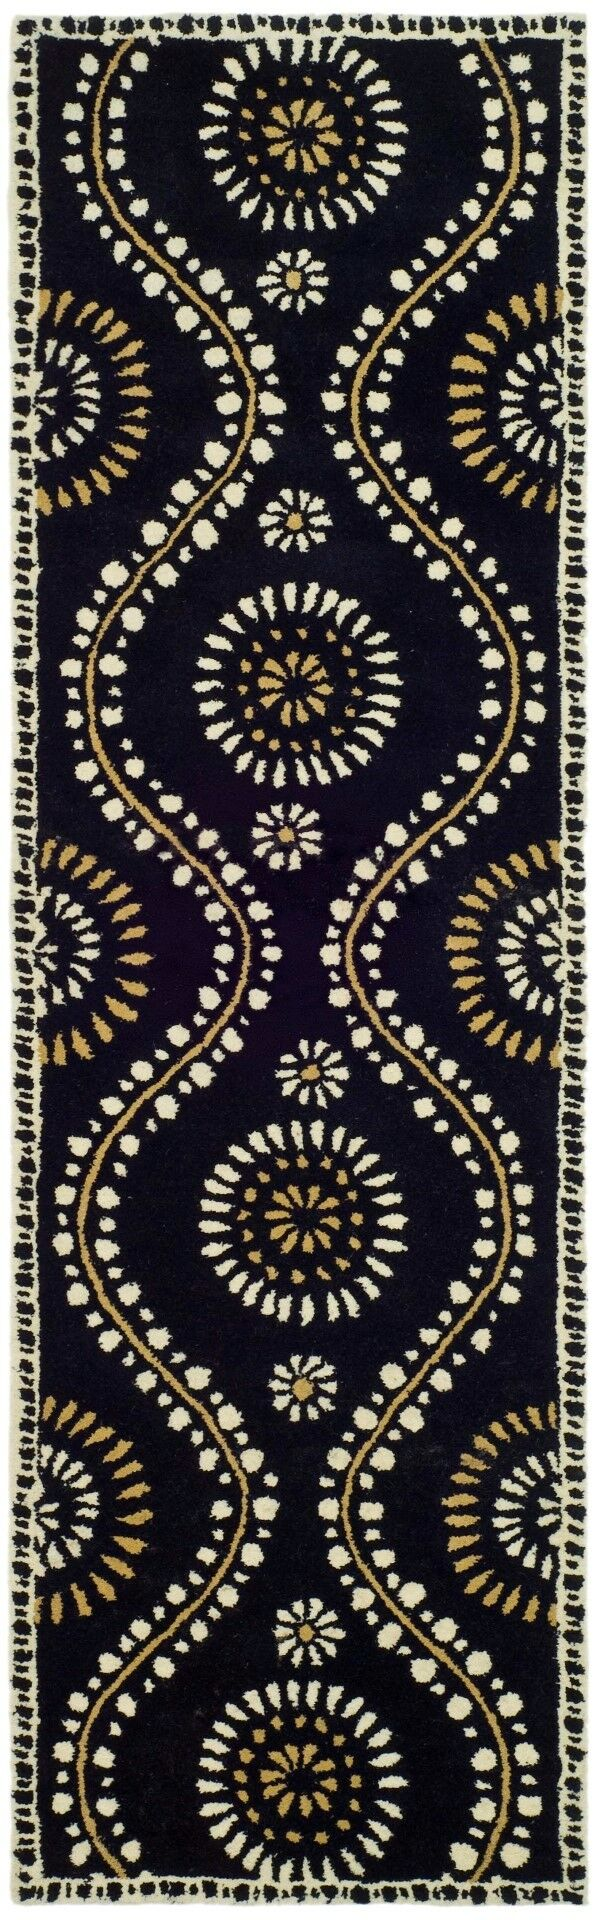 Martha Stewart Tufted / Hand Loomed Black Area Rug Rug Size: Runner 2'3